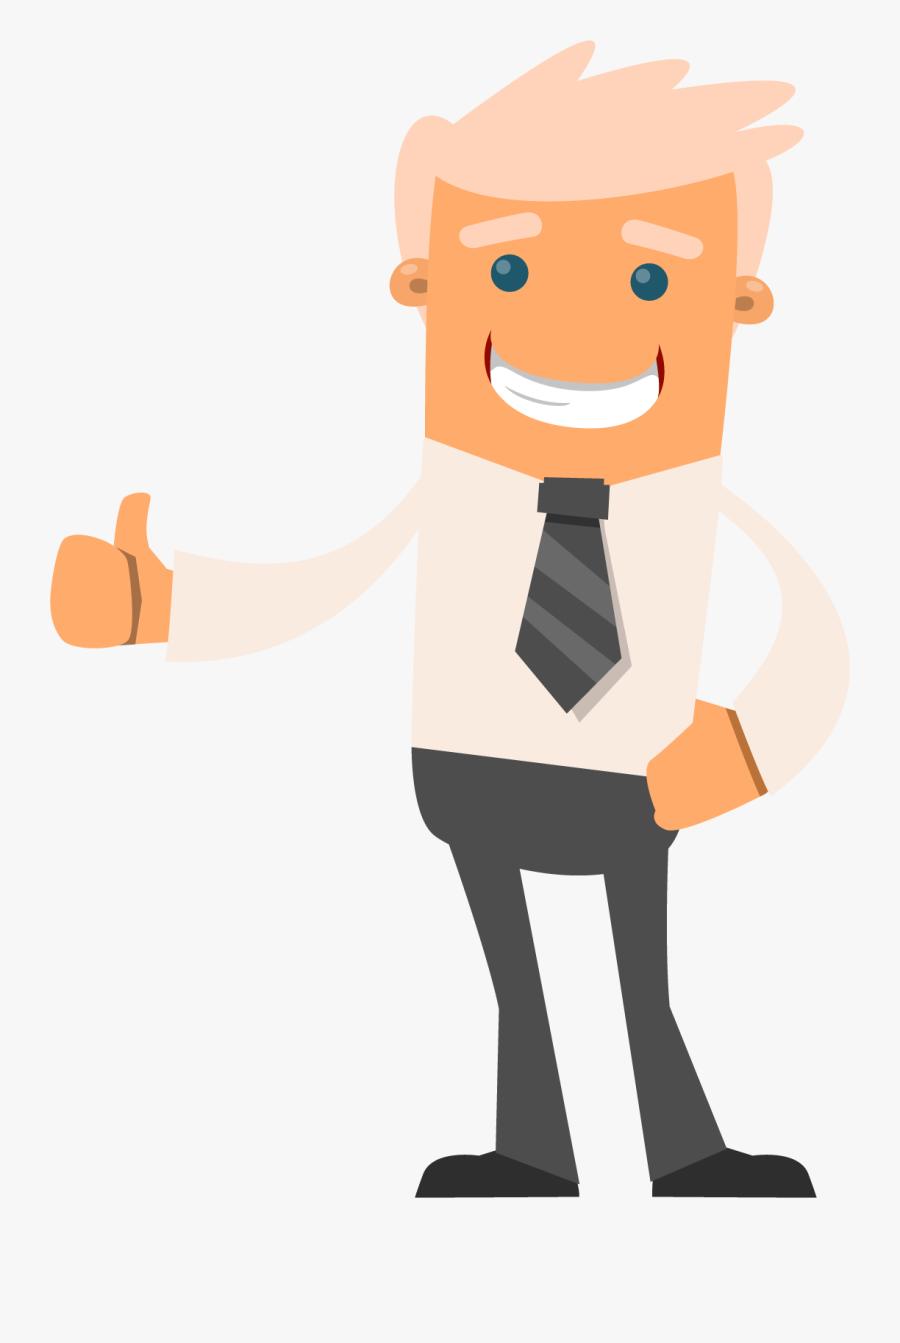 Good Clipart Happy Person - Happy Man Clipart Png, Transparent Clipart